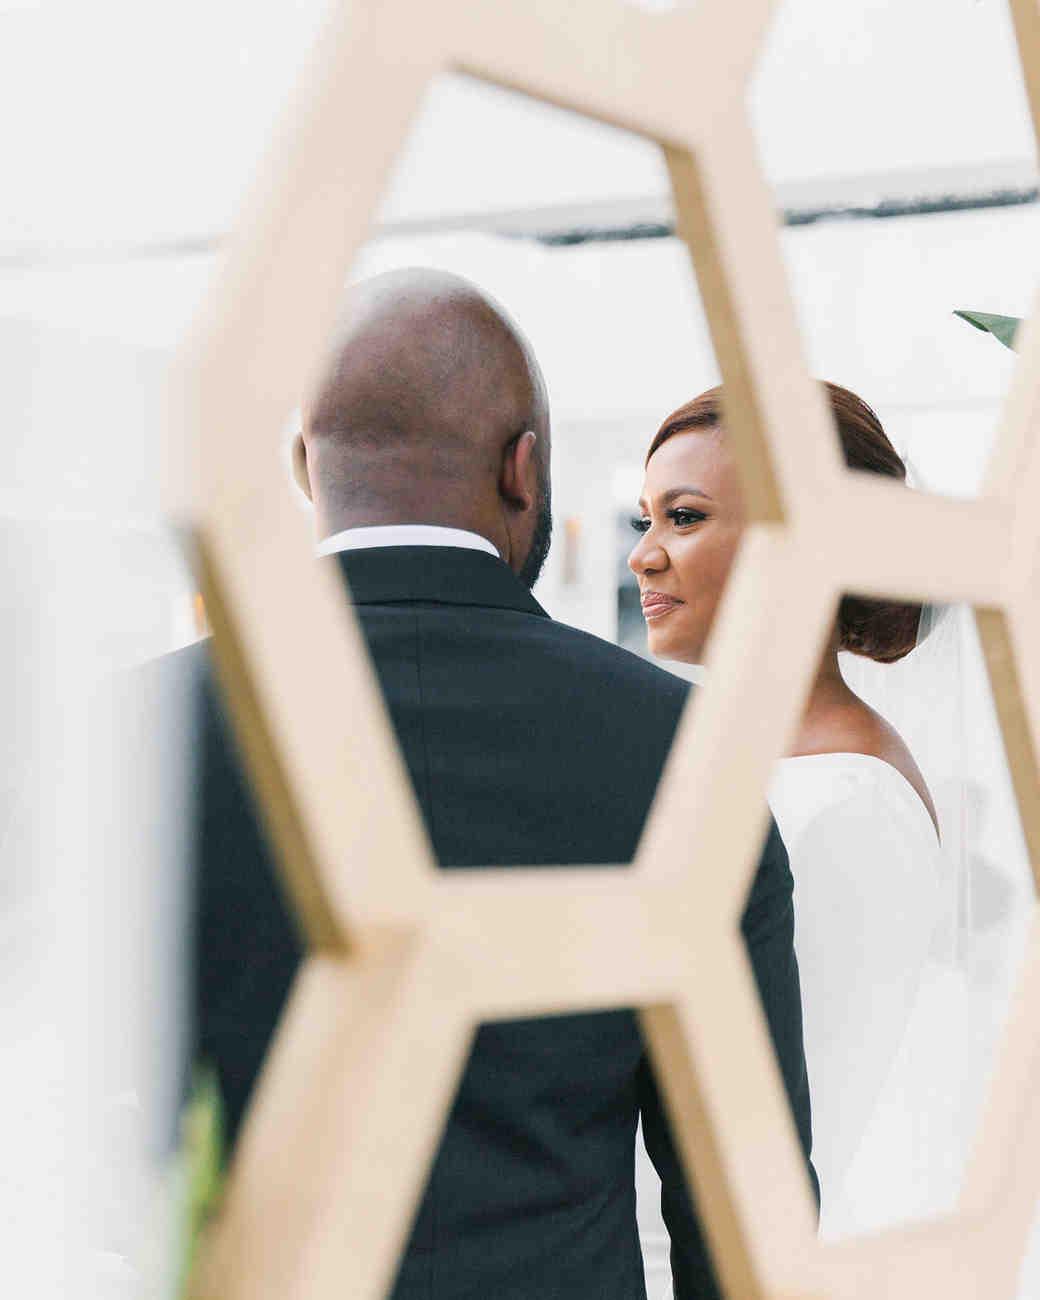 vanessa abidemi wedding couple through golden fence